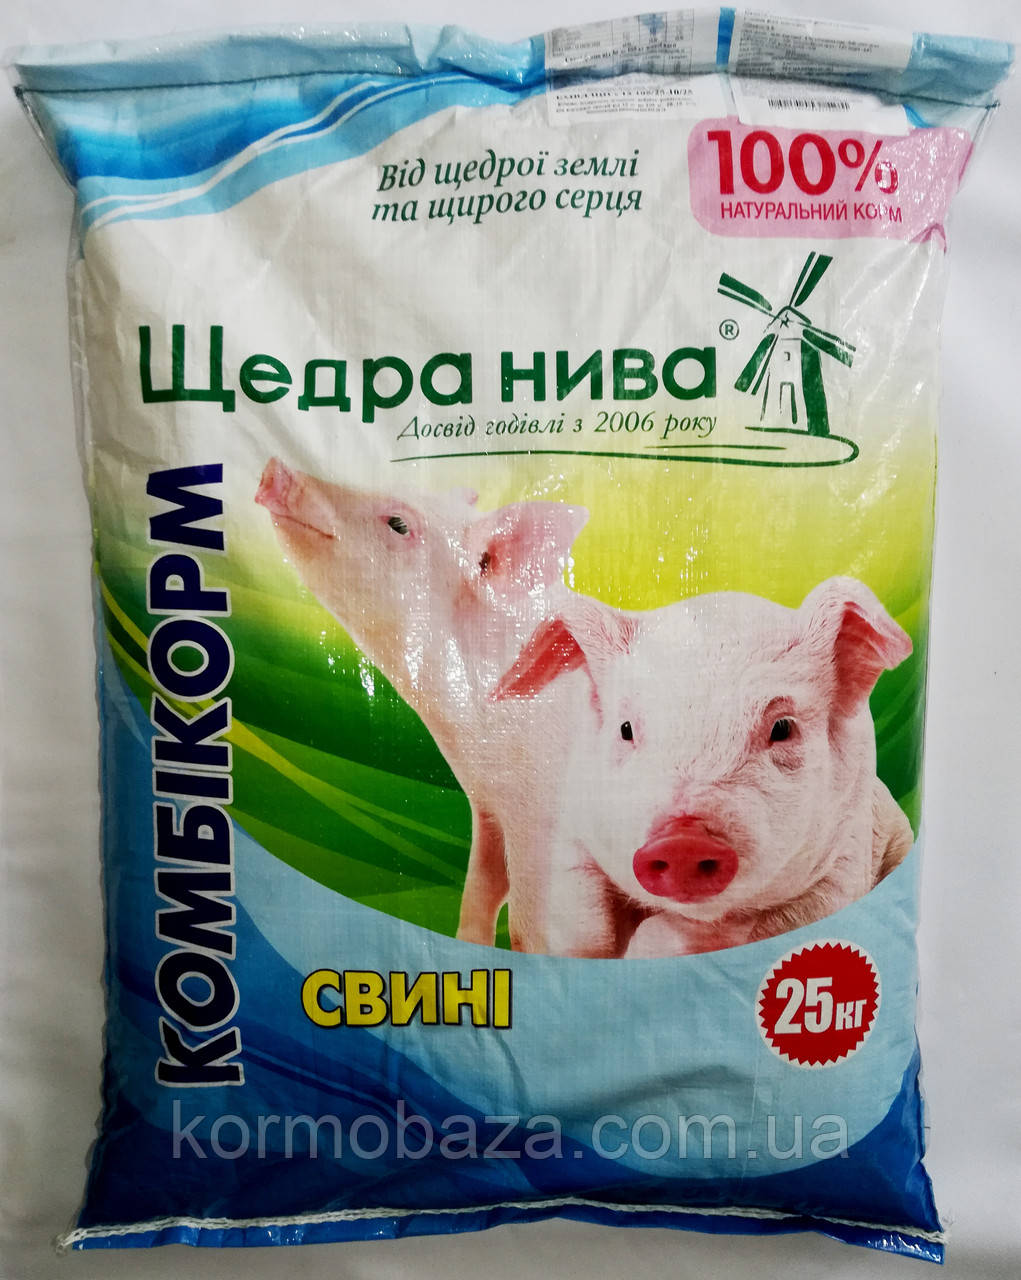 Добавка БМВД для свиней старт Щедра Нива 25%